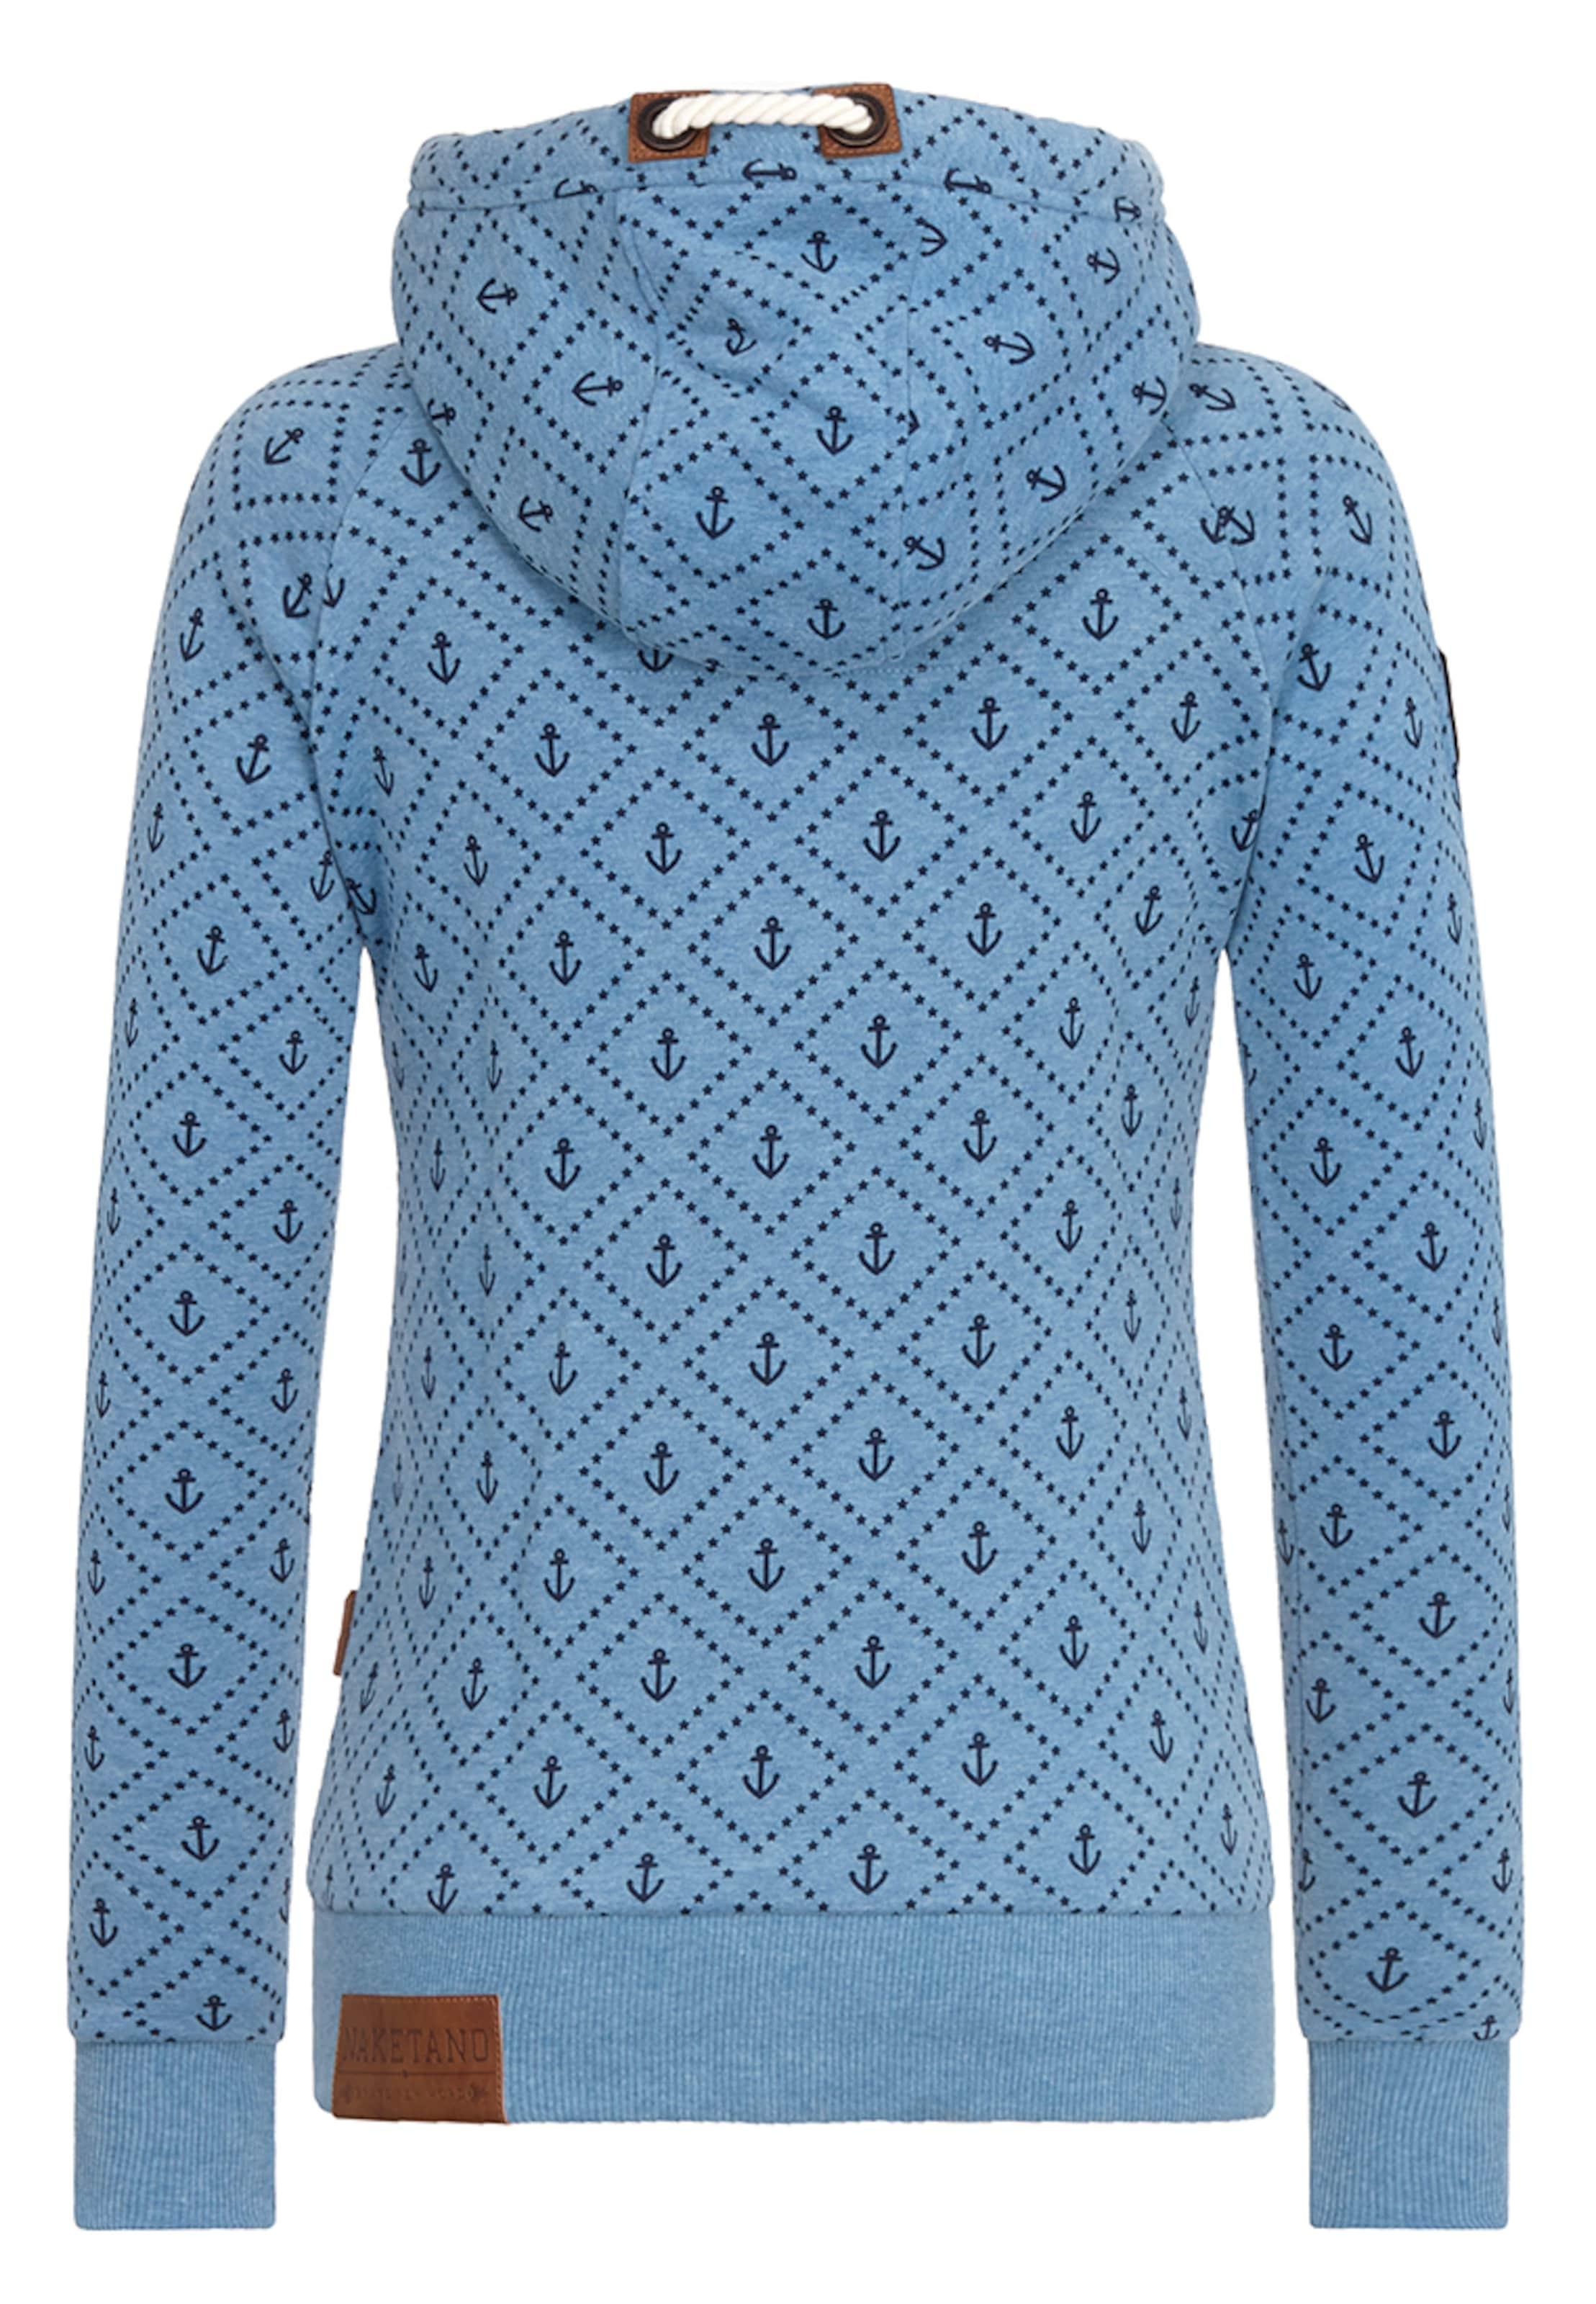 naketano Zipped Jacket 'Jennifer Hart IV' Billig Verkauf Vorbestellung Billig Verkauf Echten TLJt1L3